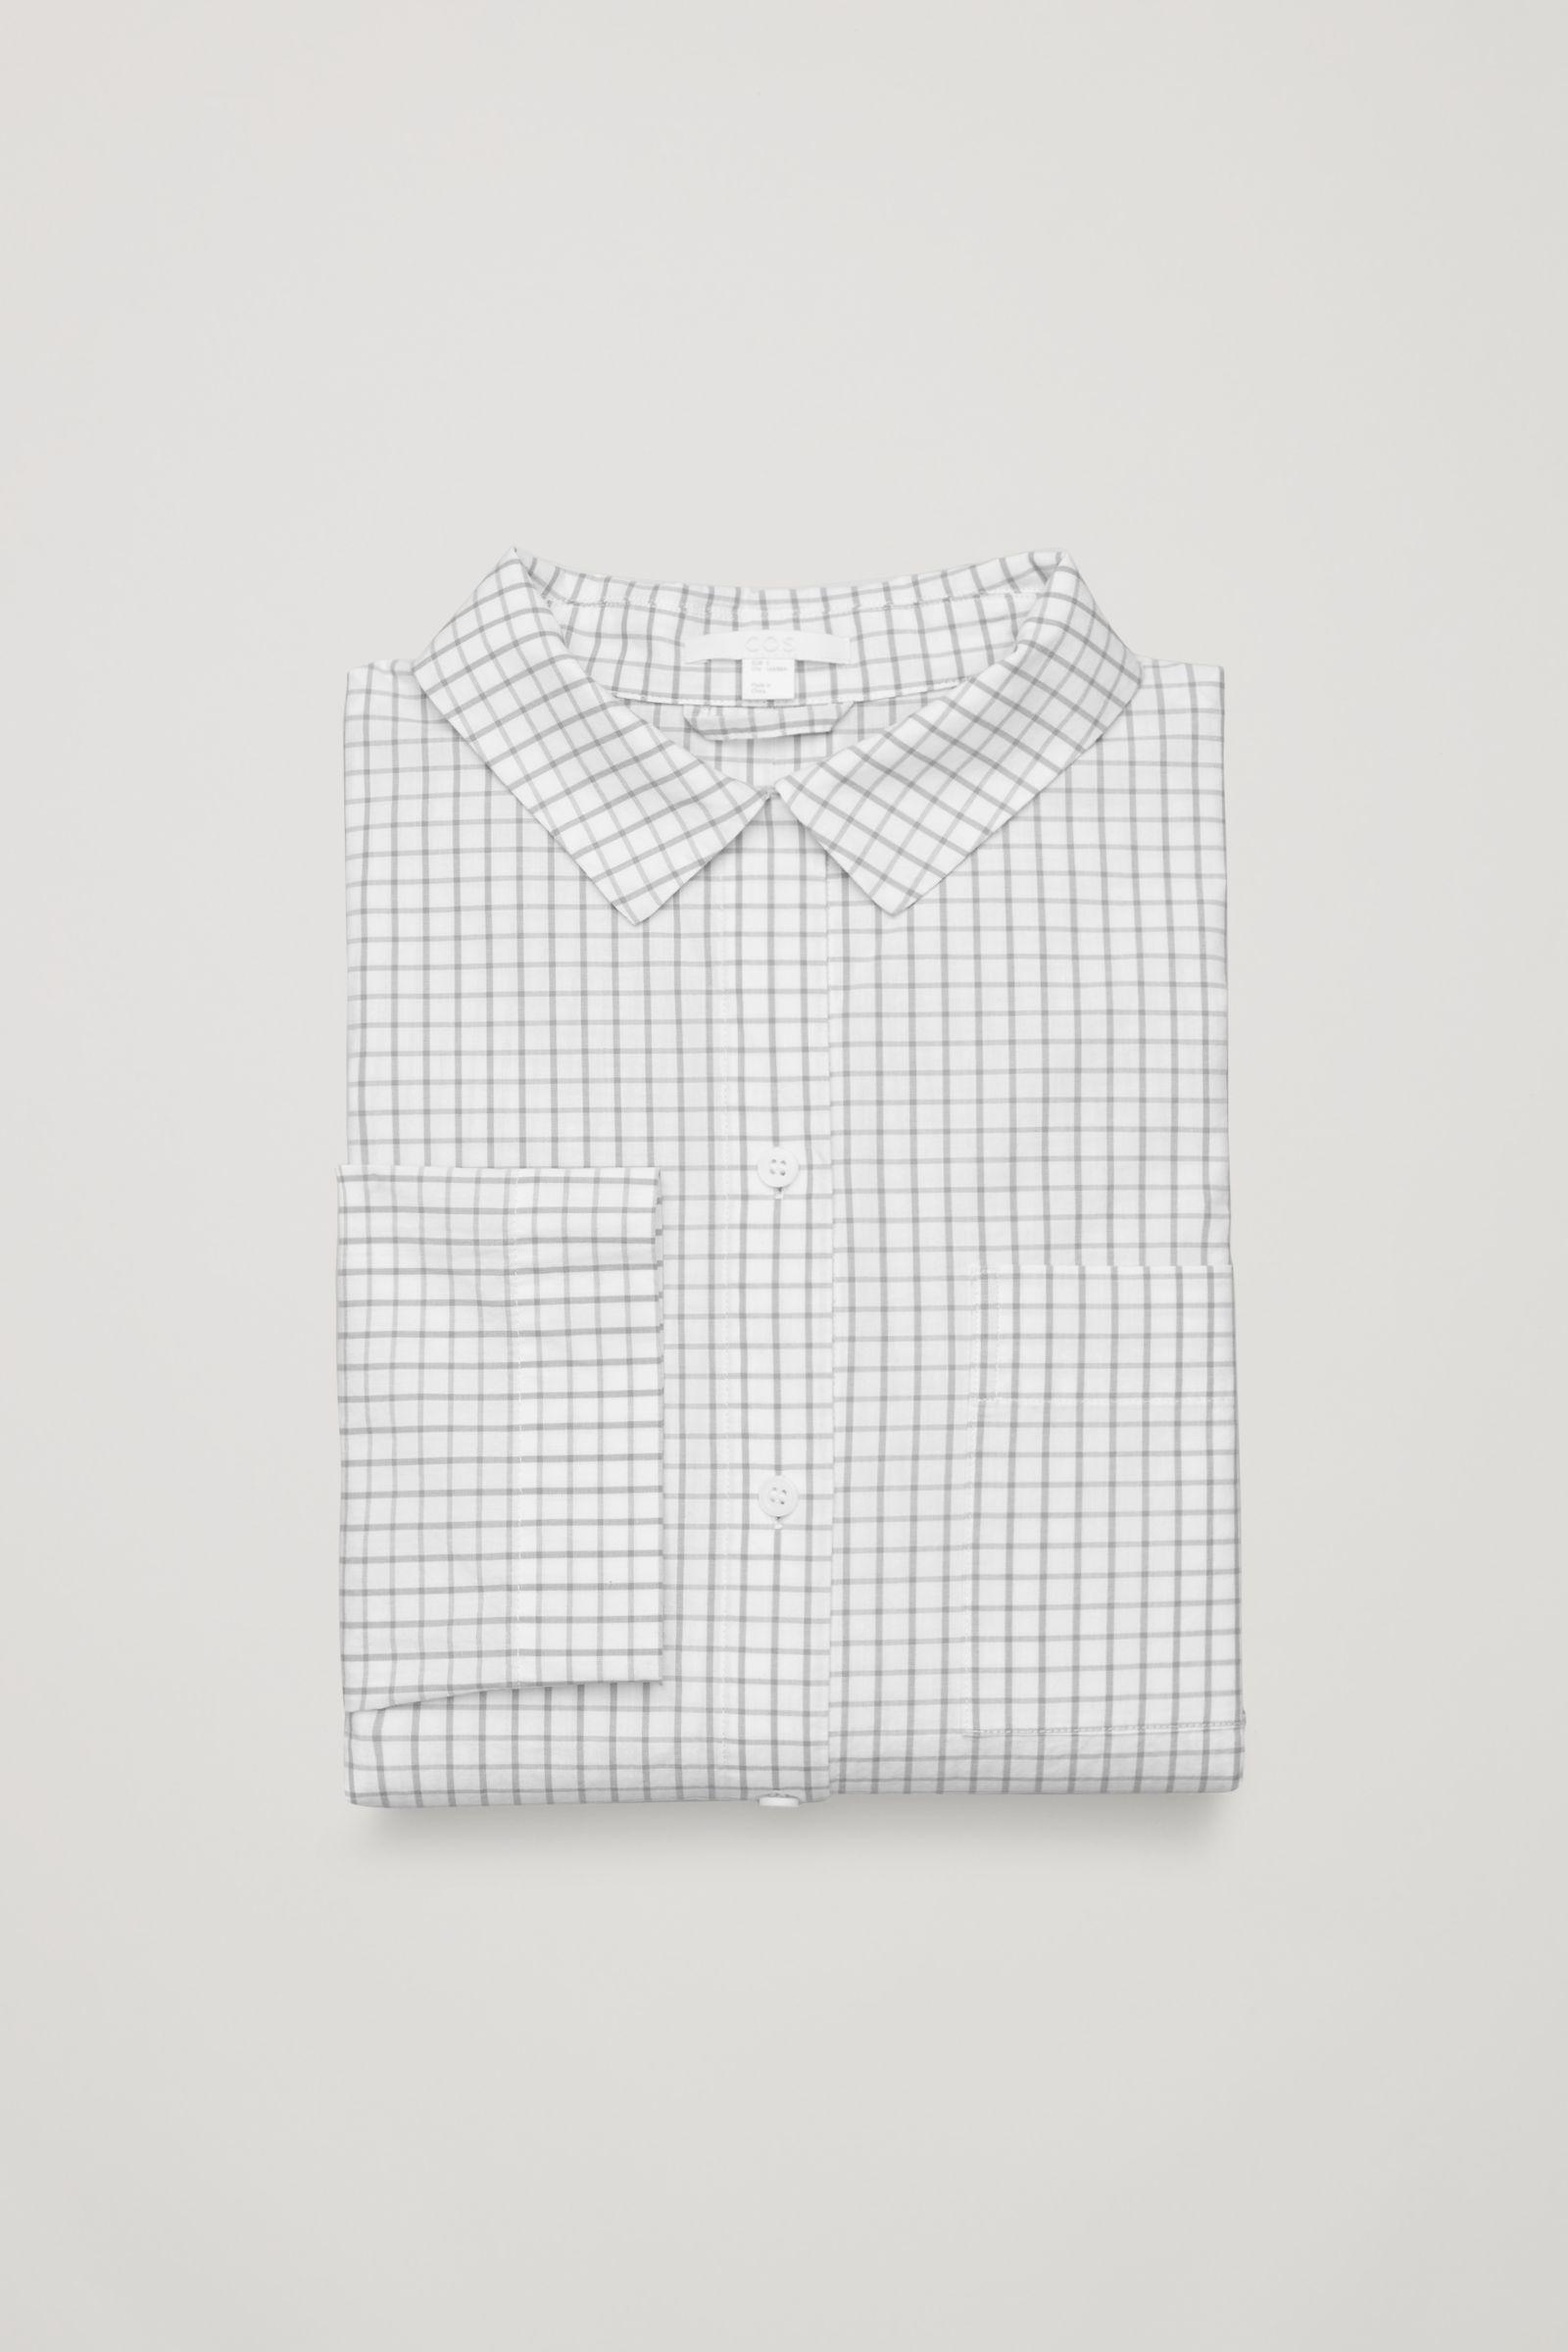 Cos Check Pyjama Shirt In Gray